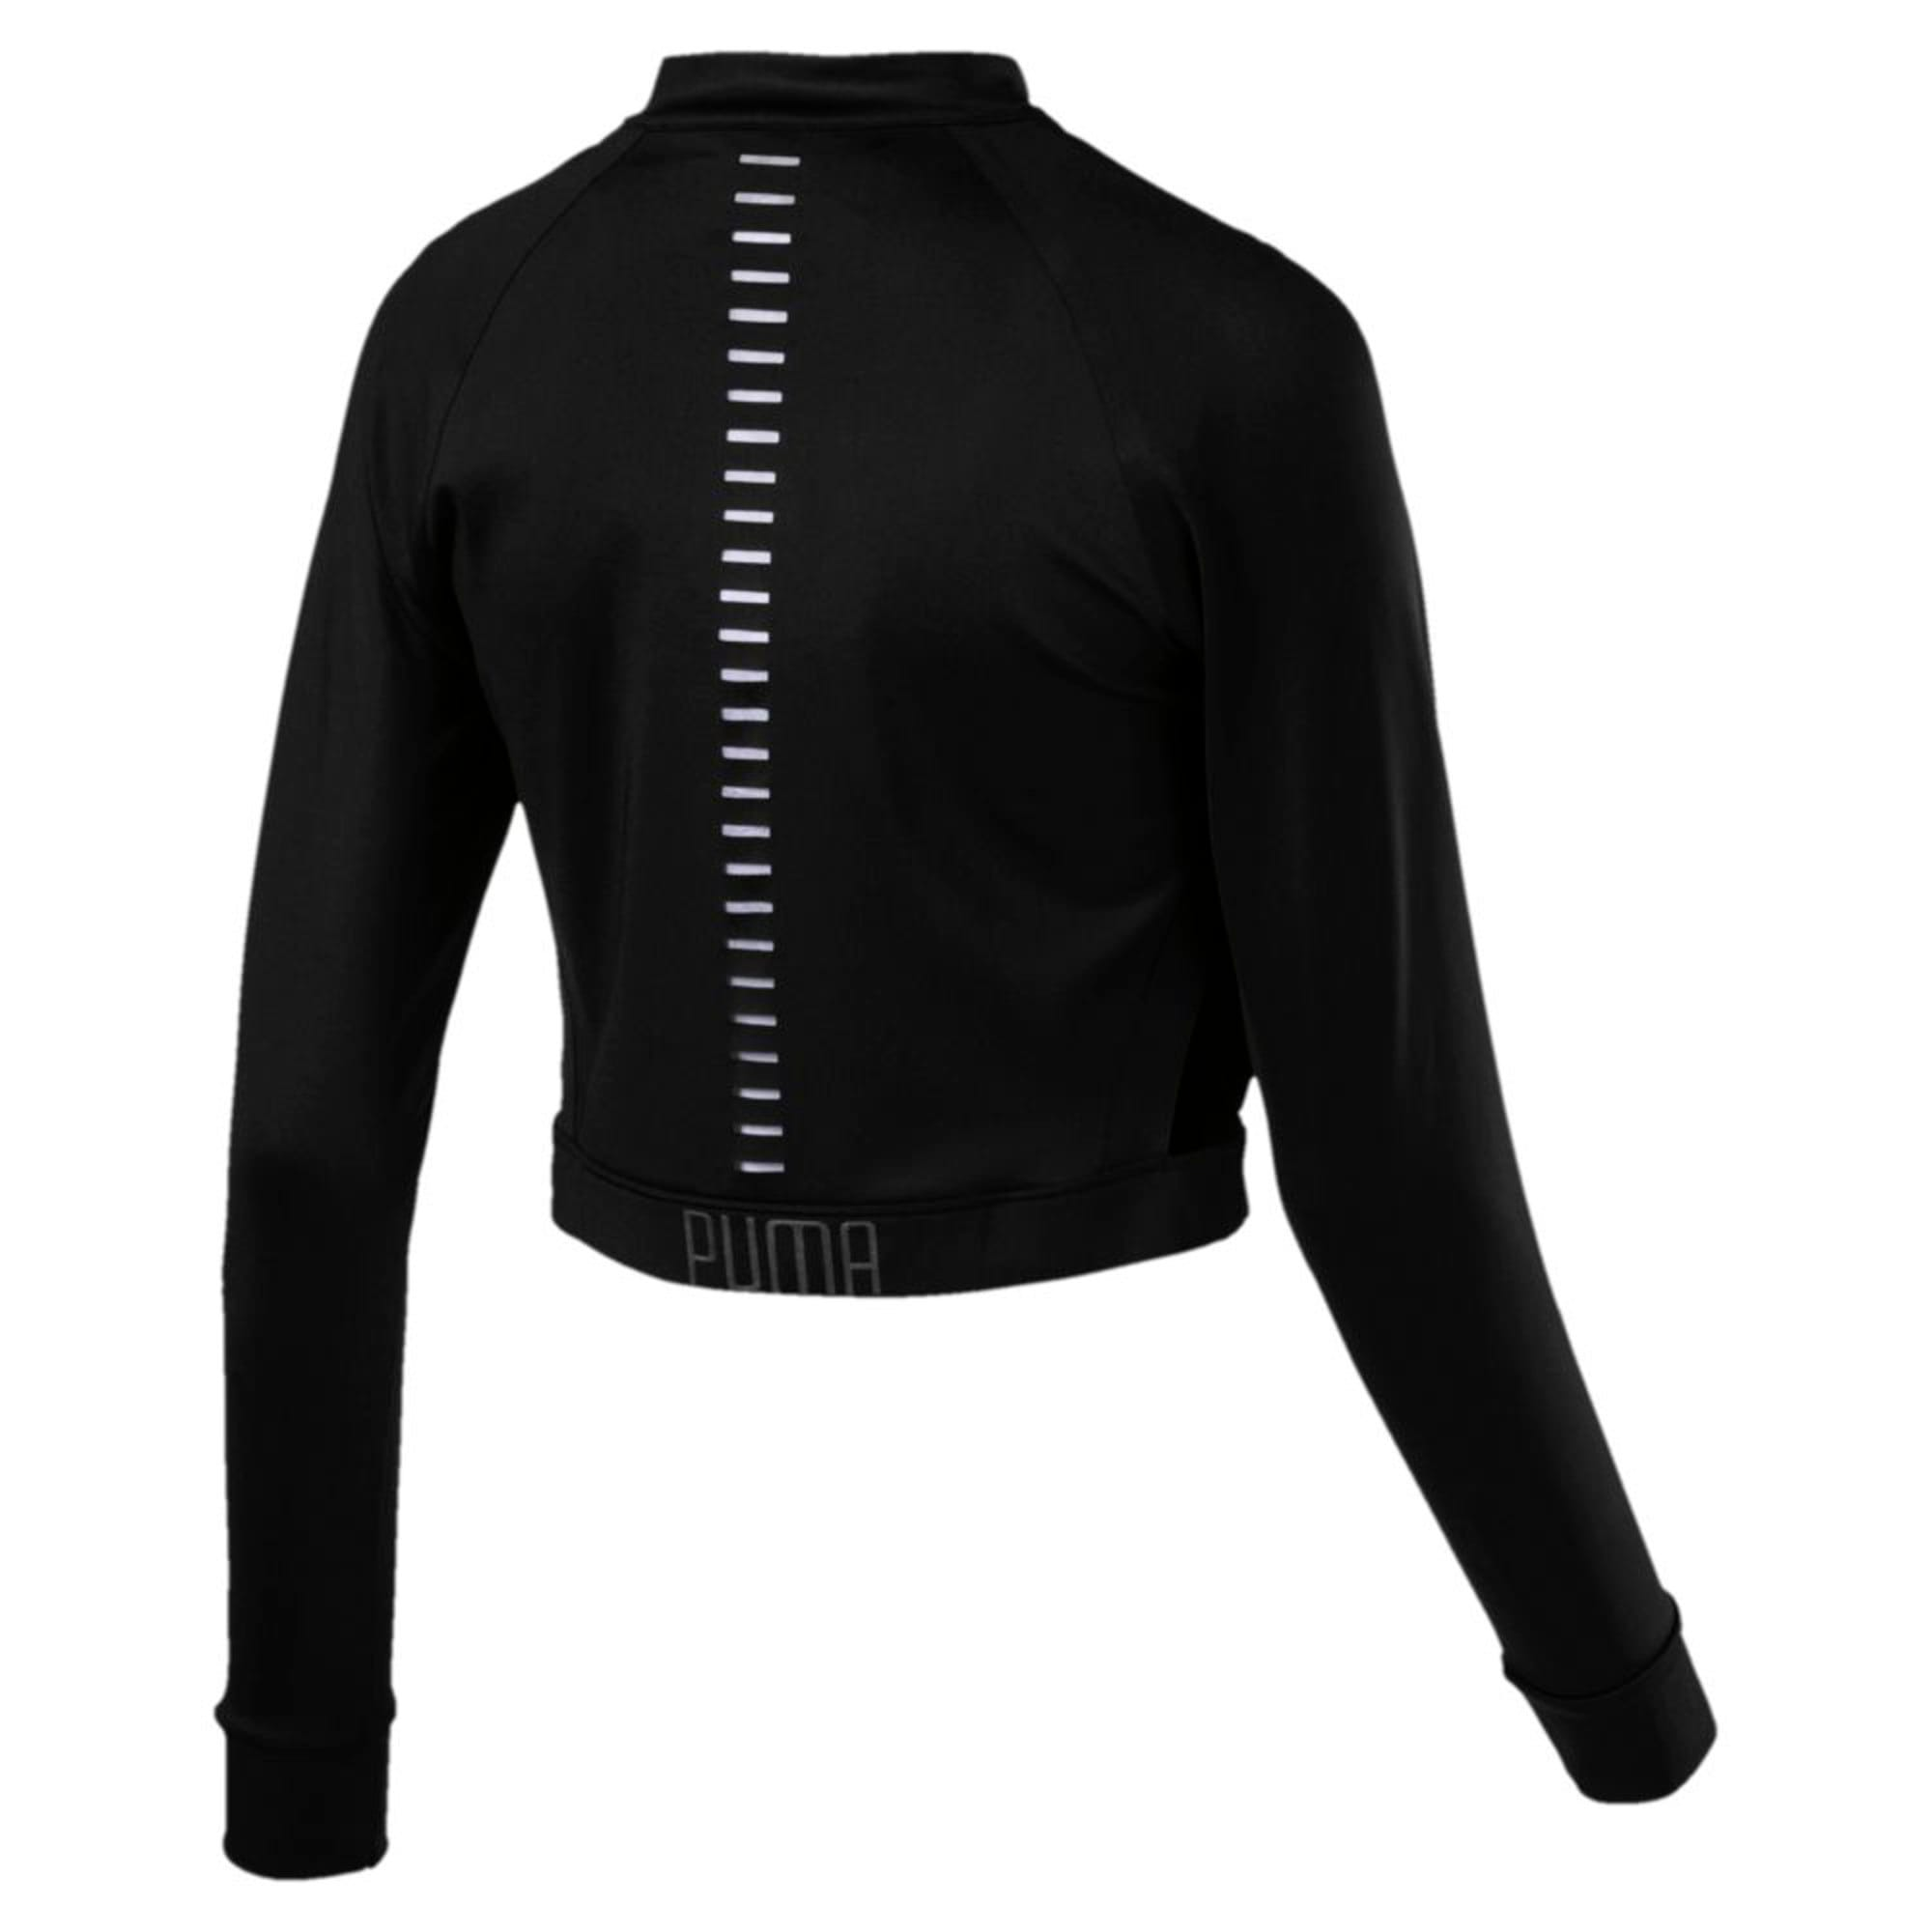 Thumbnail 3 of Explosive Cut-Out Women's Jacket, Puma Black, medium-IND